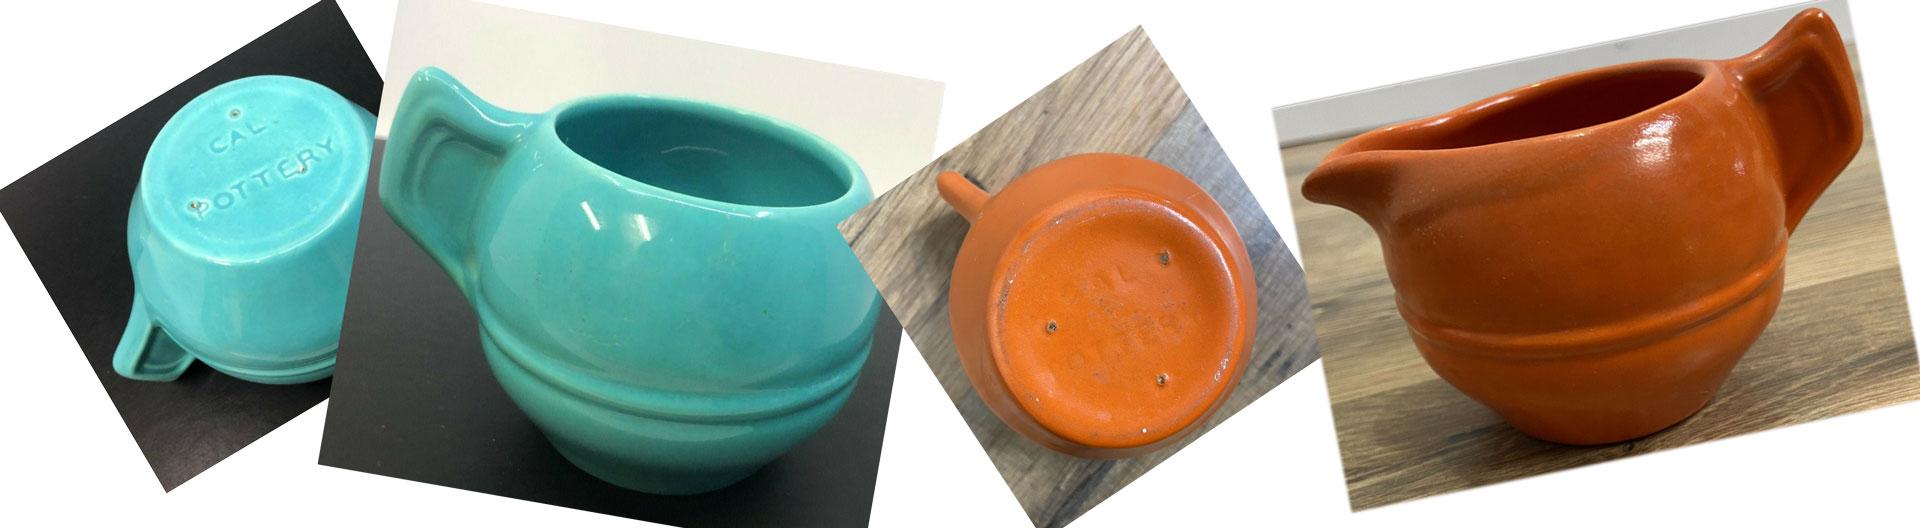 QwkDog Metlox Pottery Creamer Sugar